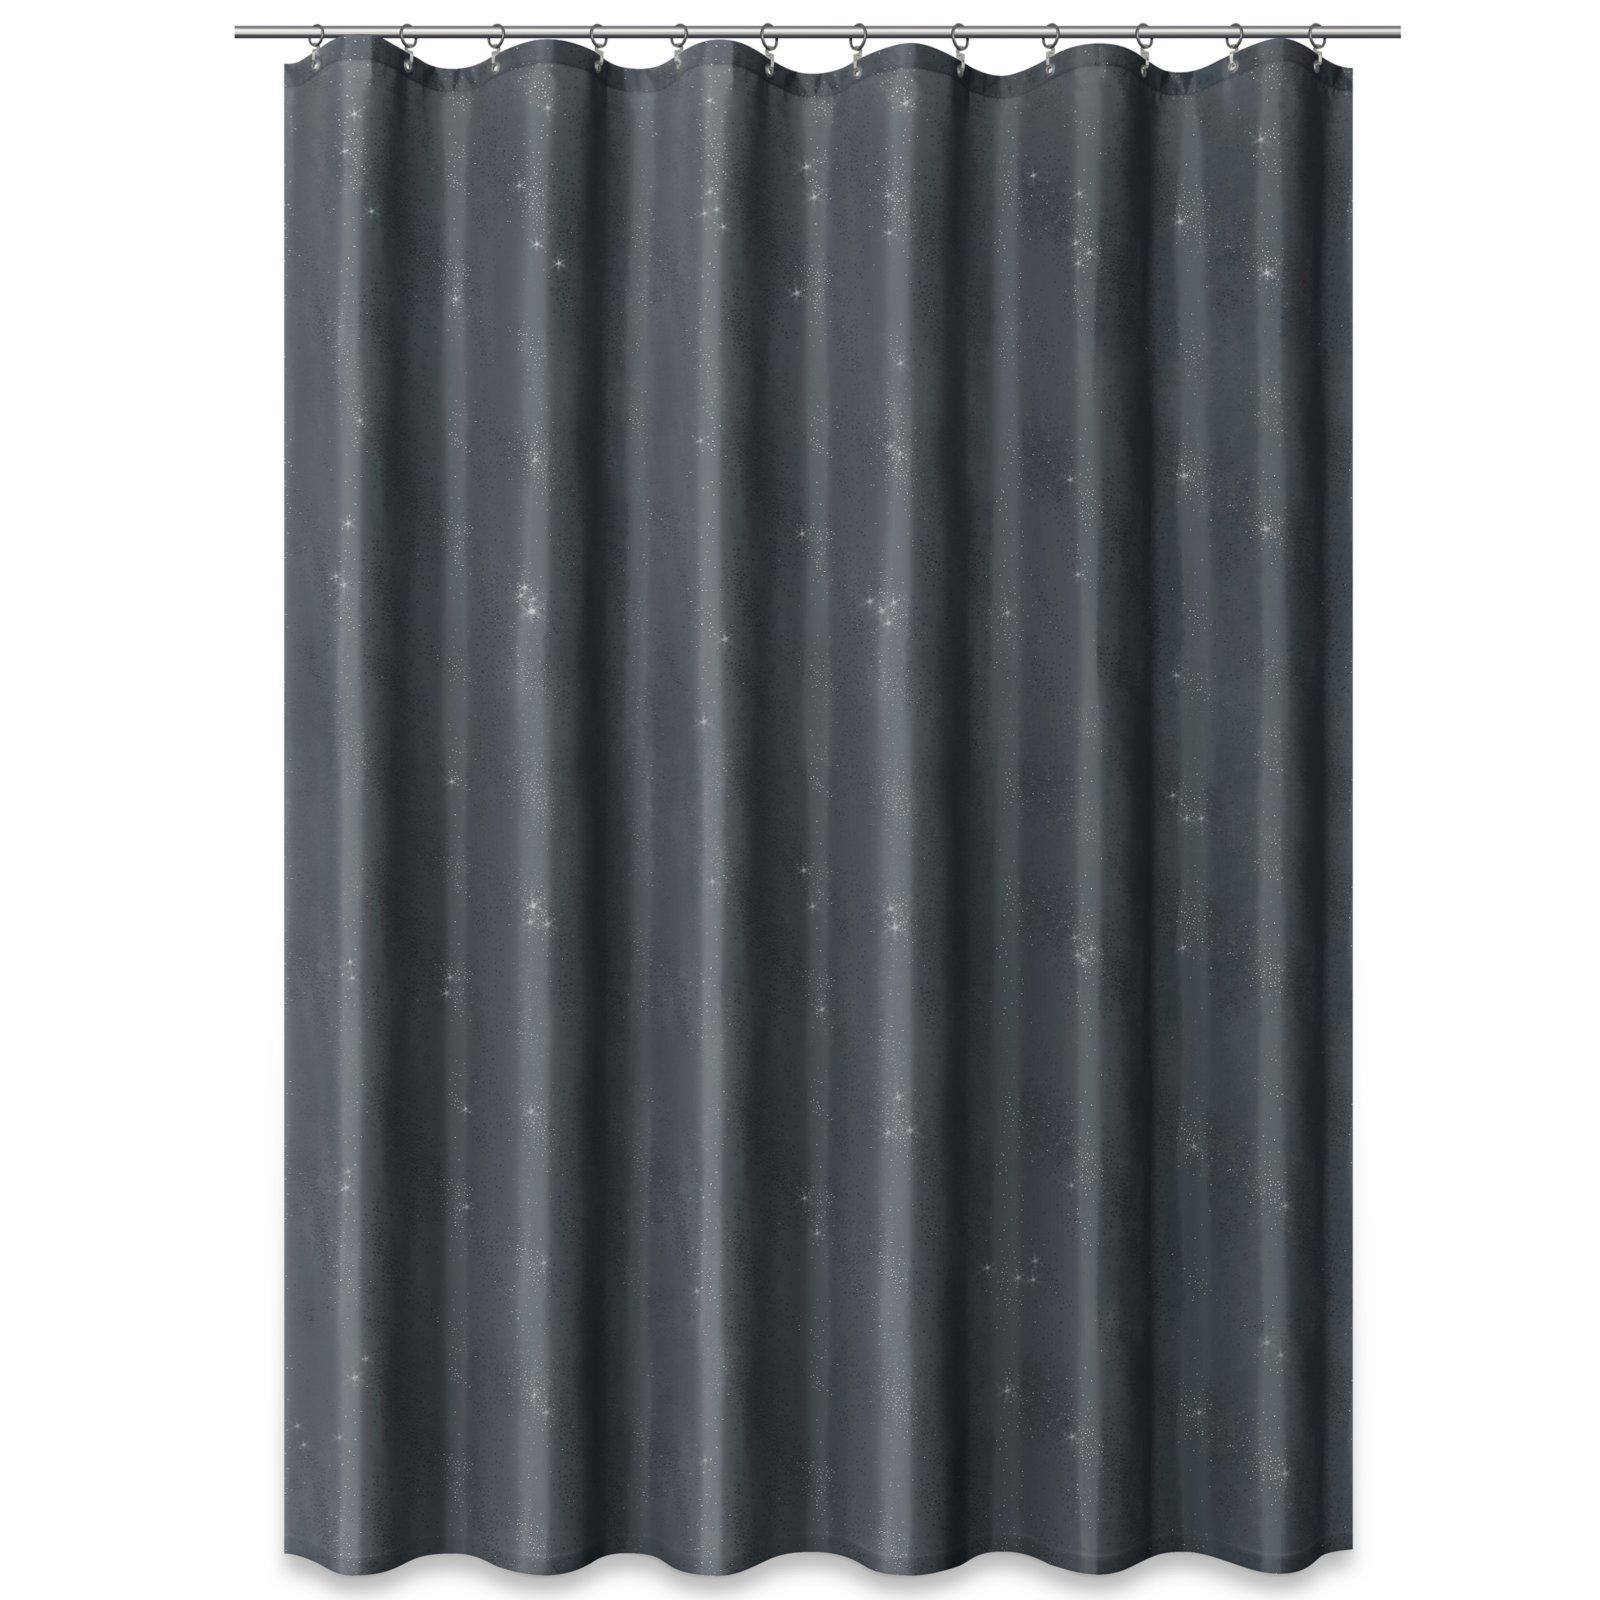 duschvorhang grau mit glitzer 180x200 cm duschvorh nge rollos badezimmer. Black Bedroom Furniture Sets. Home Design Ideas